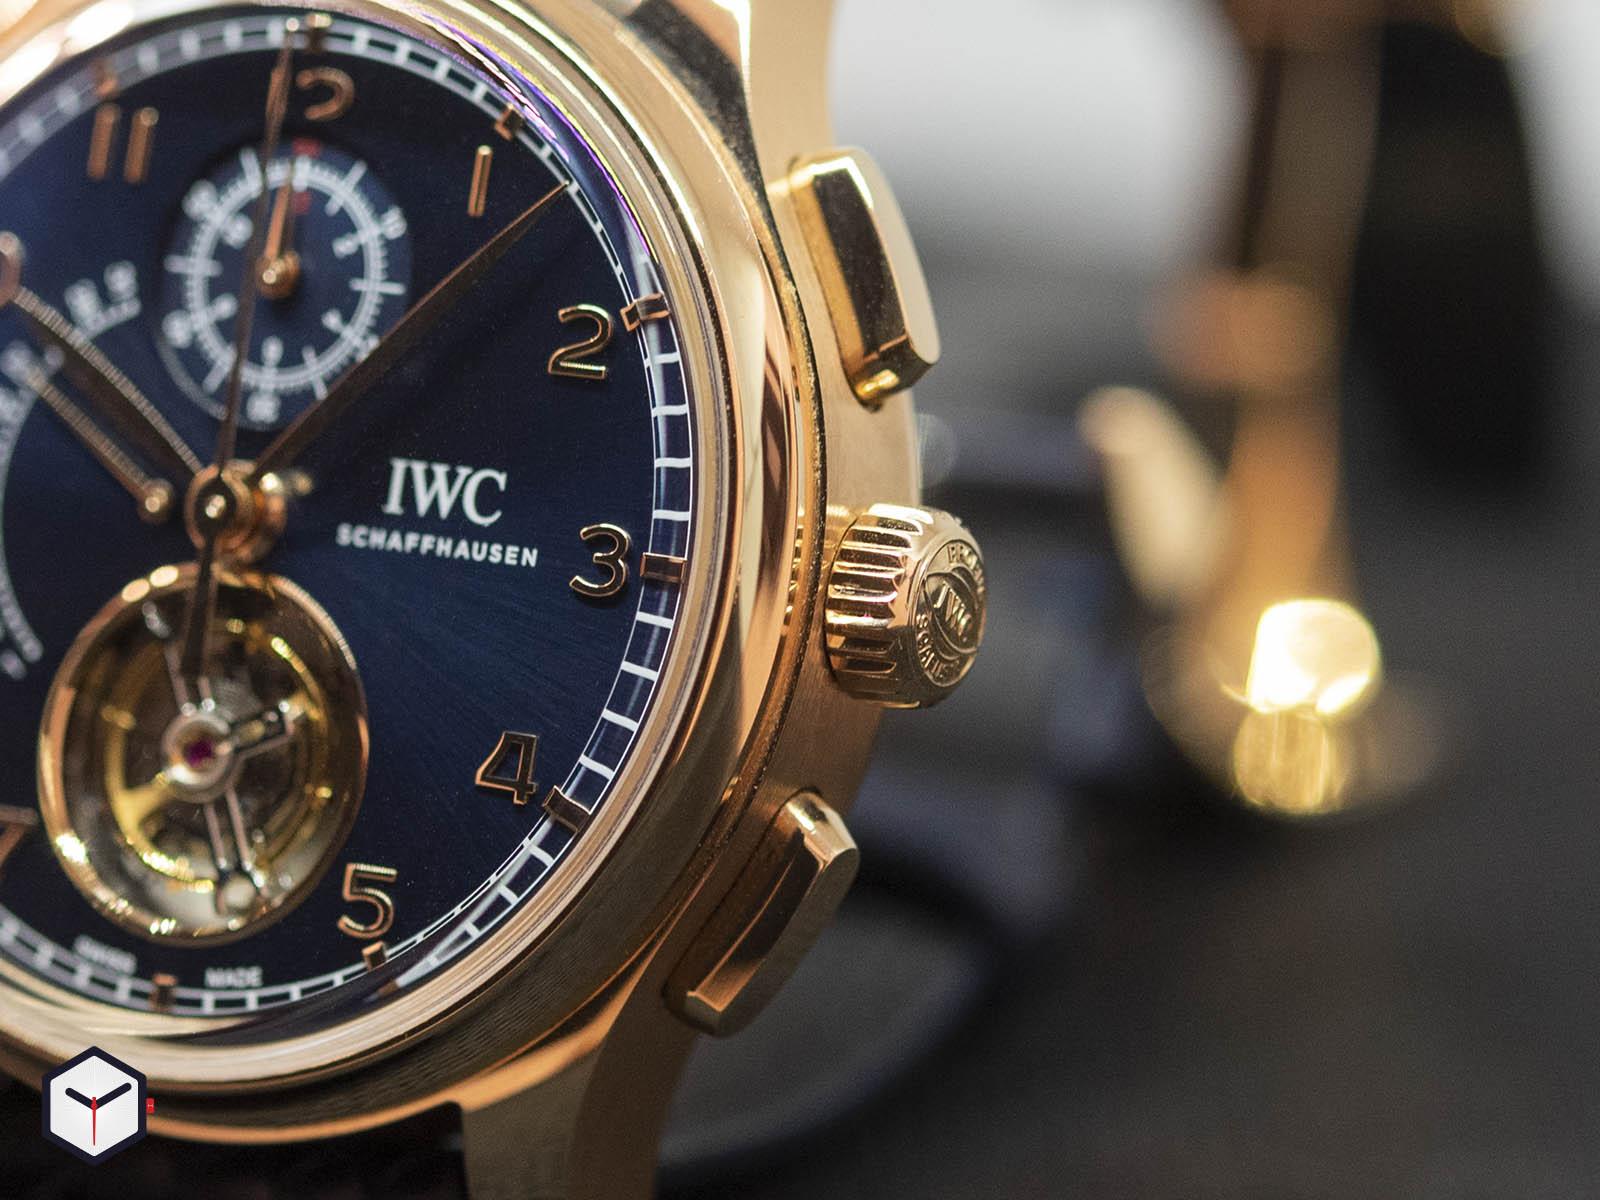 iw394005-iwc-portugieser-tourbillon-retrograde-chronograph-boutique-edition-4.jpg